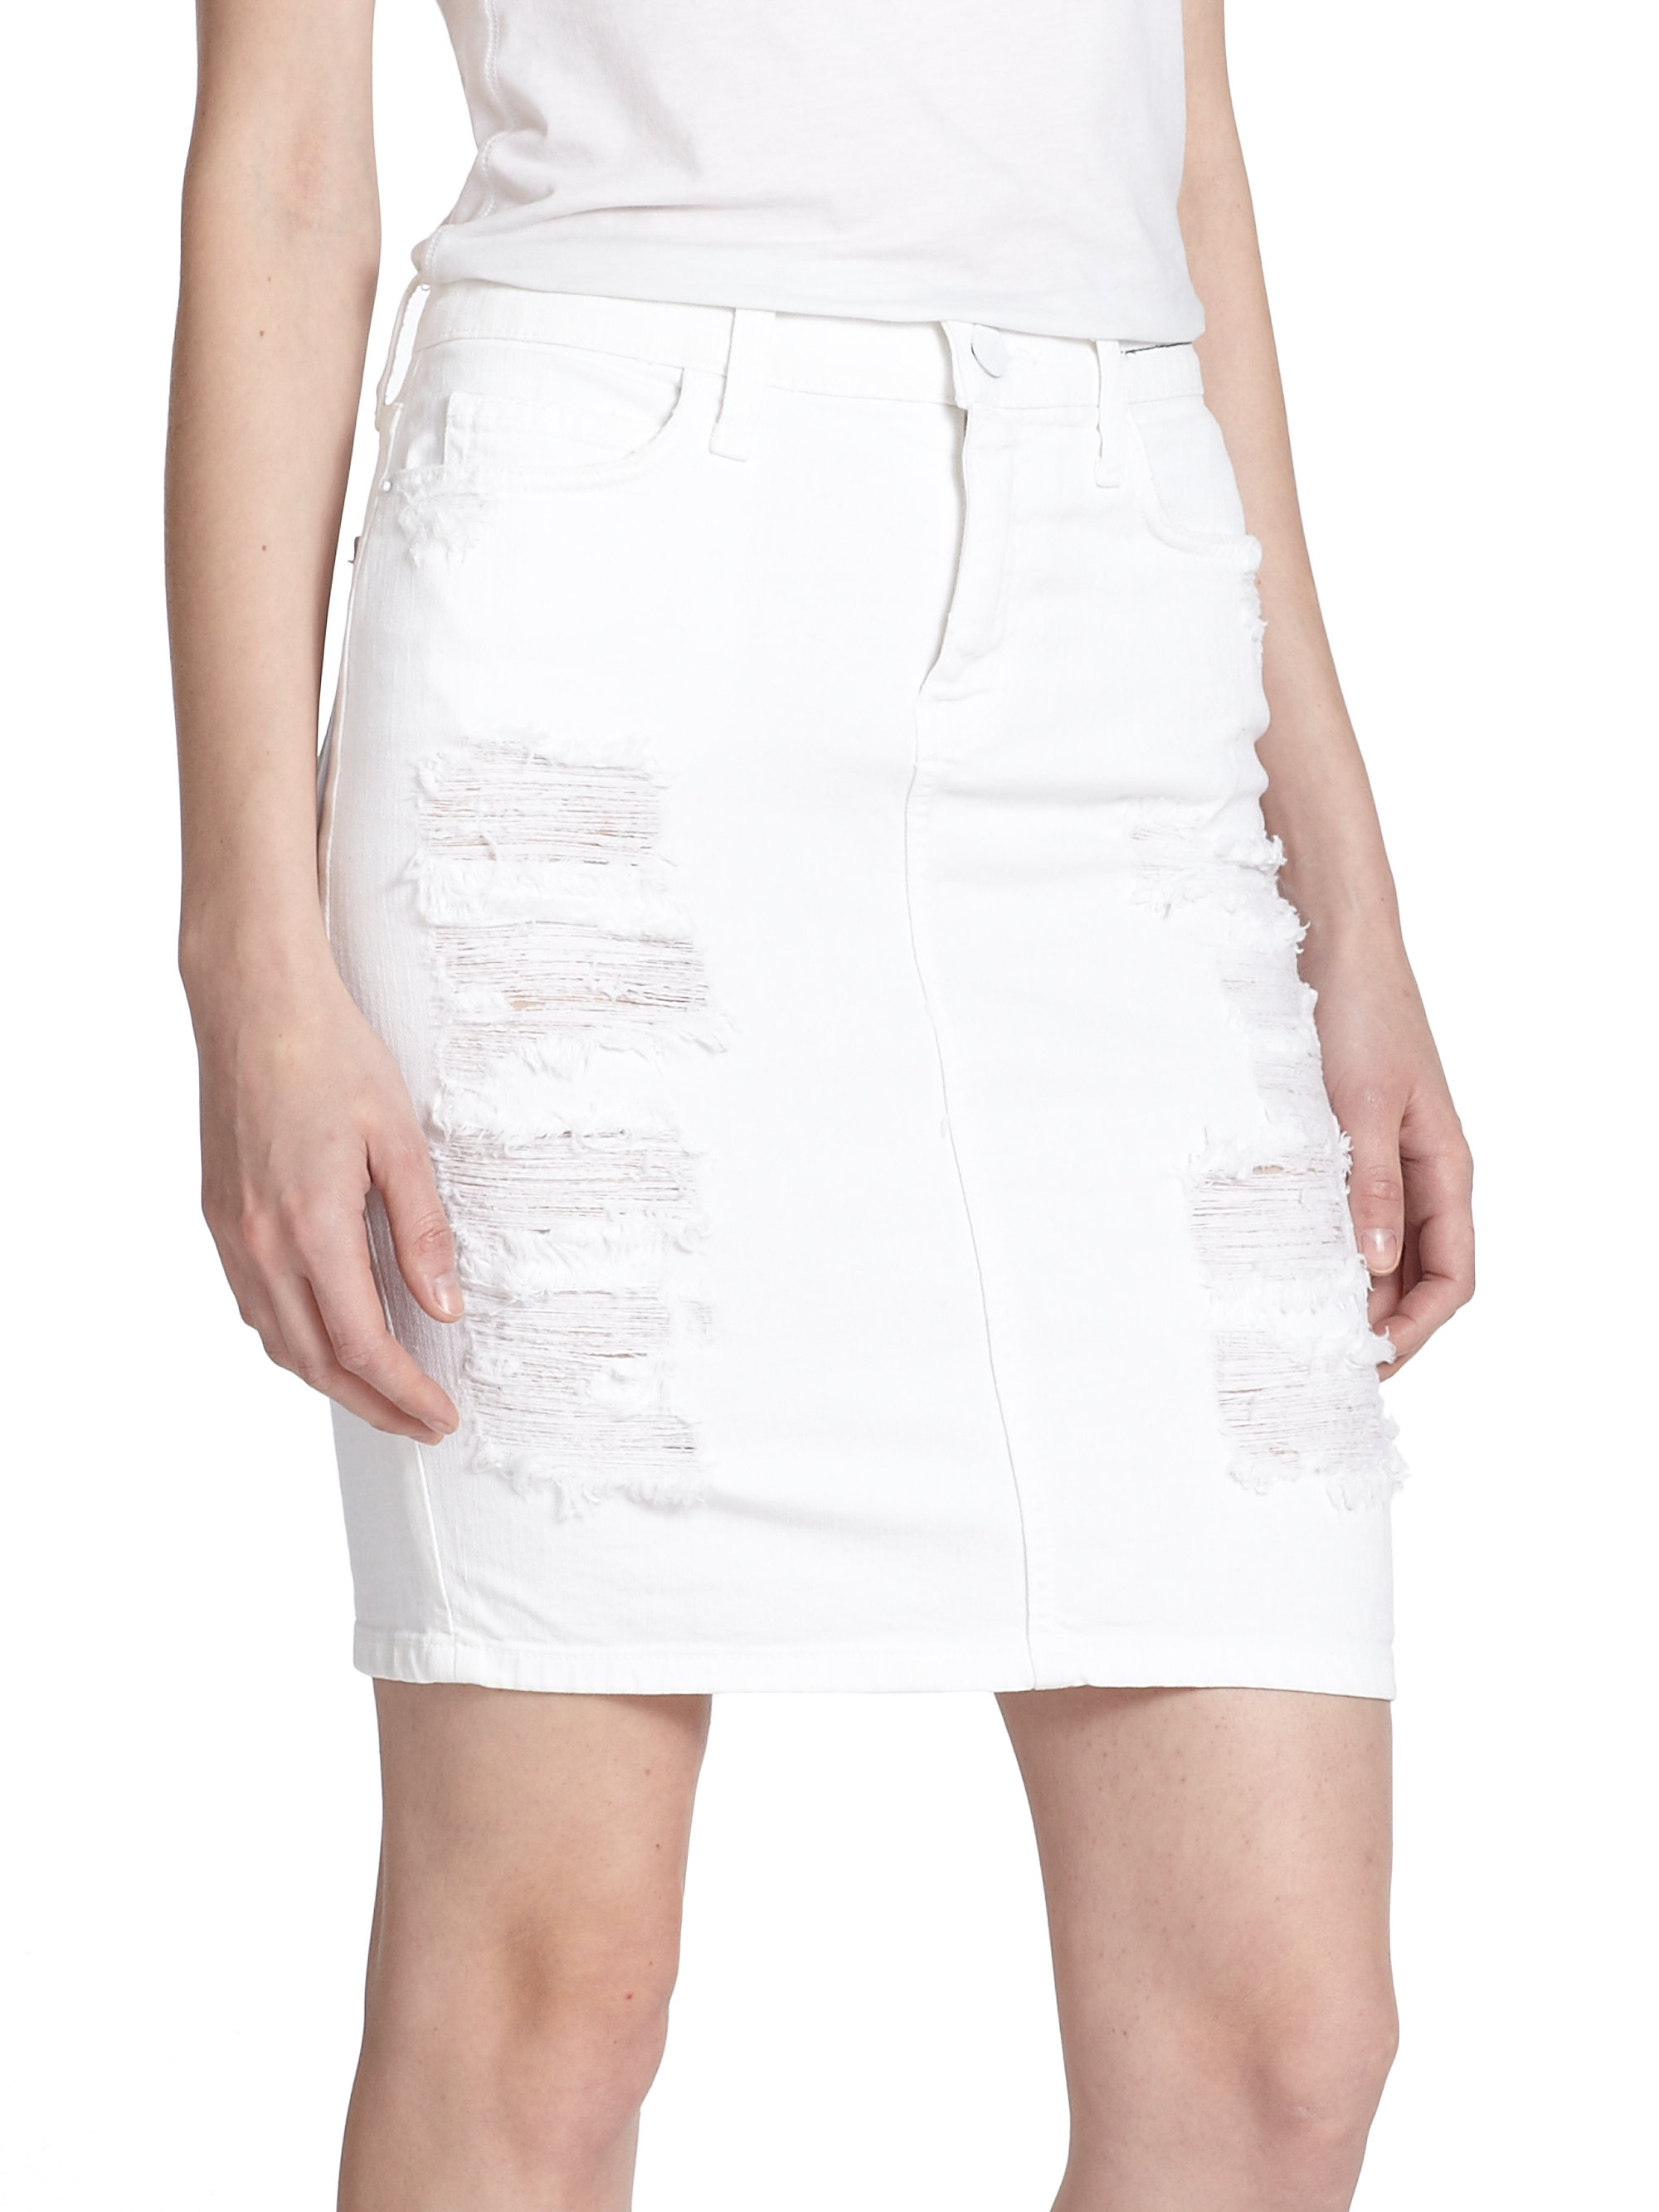 Current/elliott Distressed Denim Pencil Skirt in White | Lyst